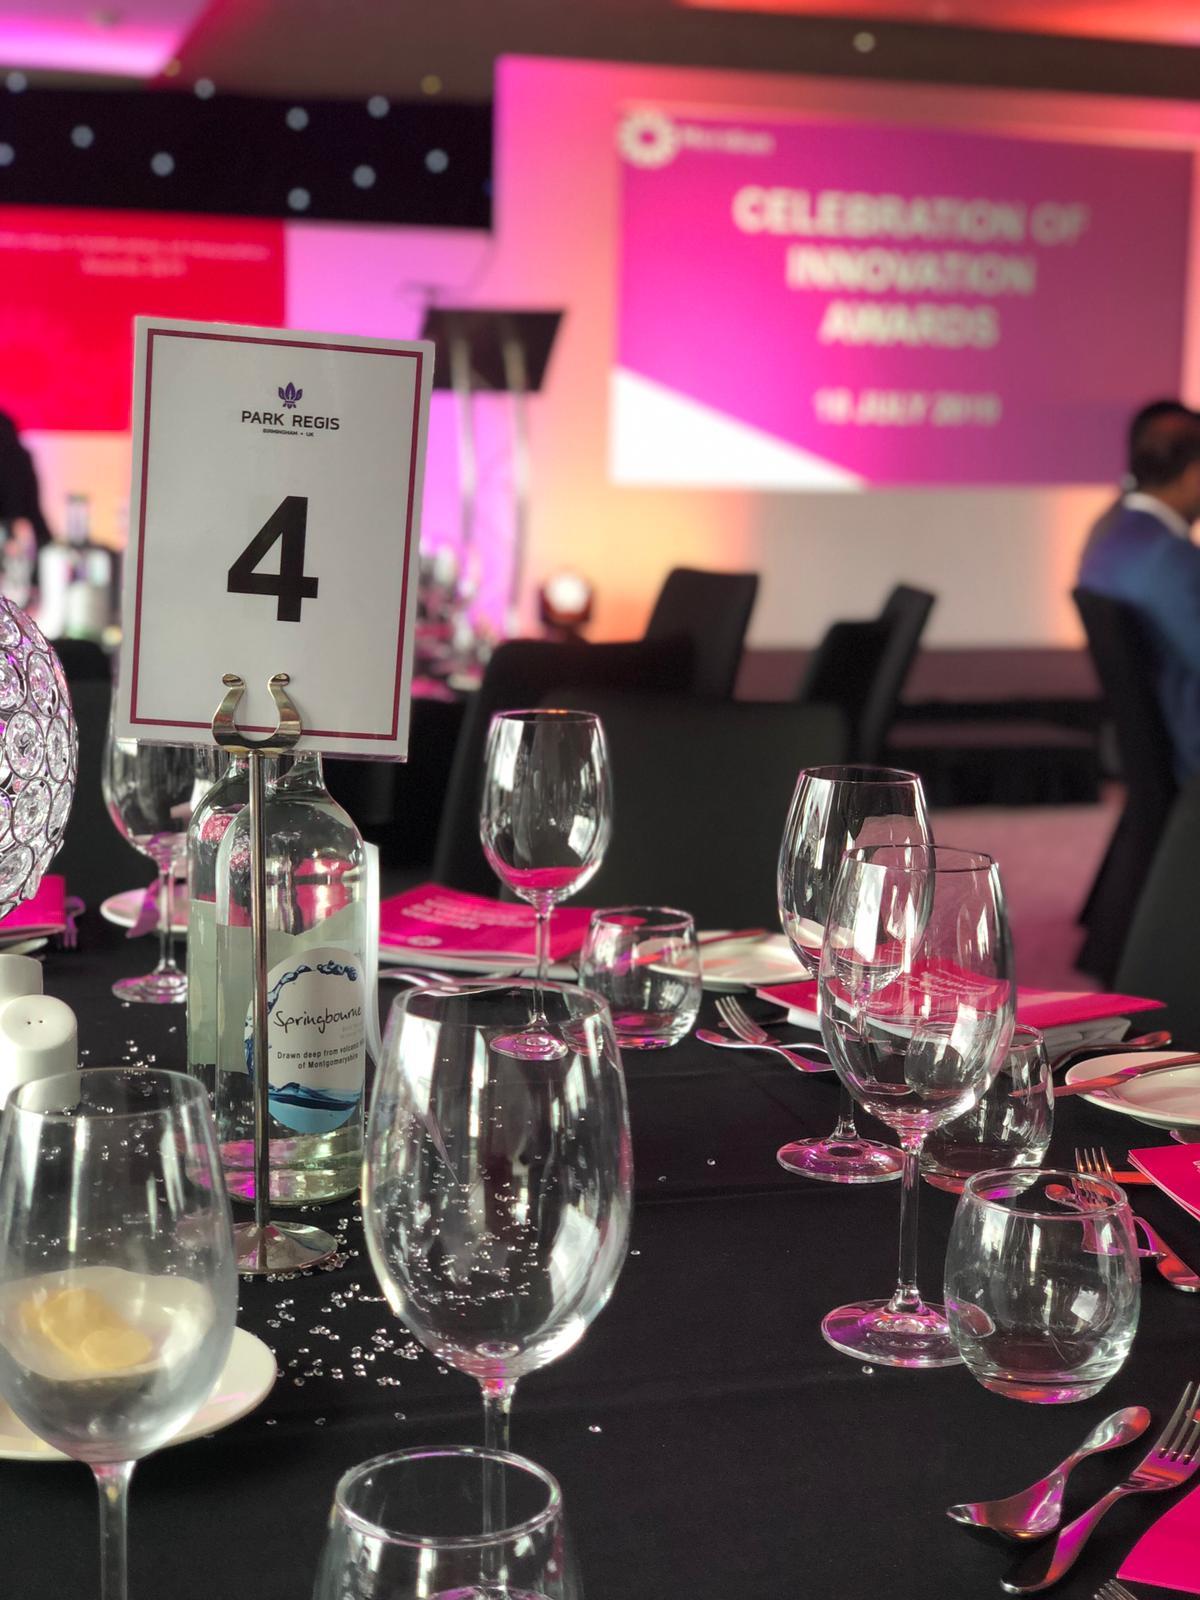 at the awards evening